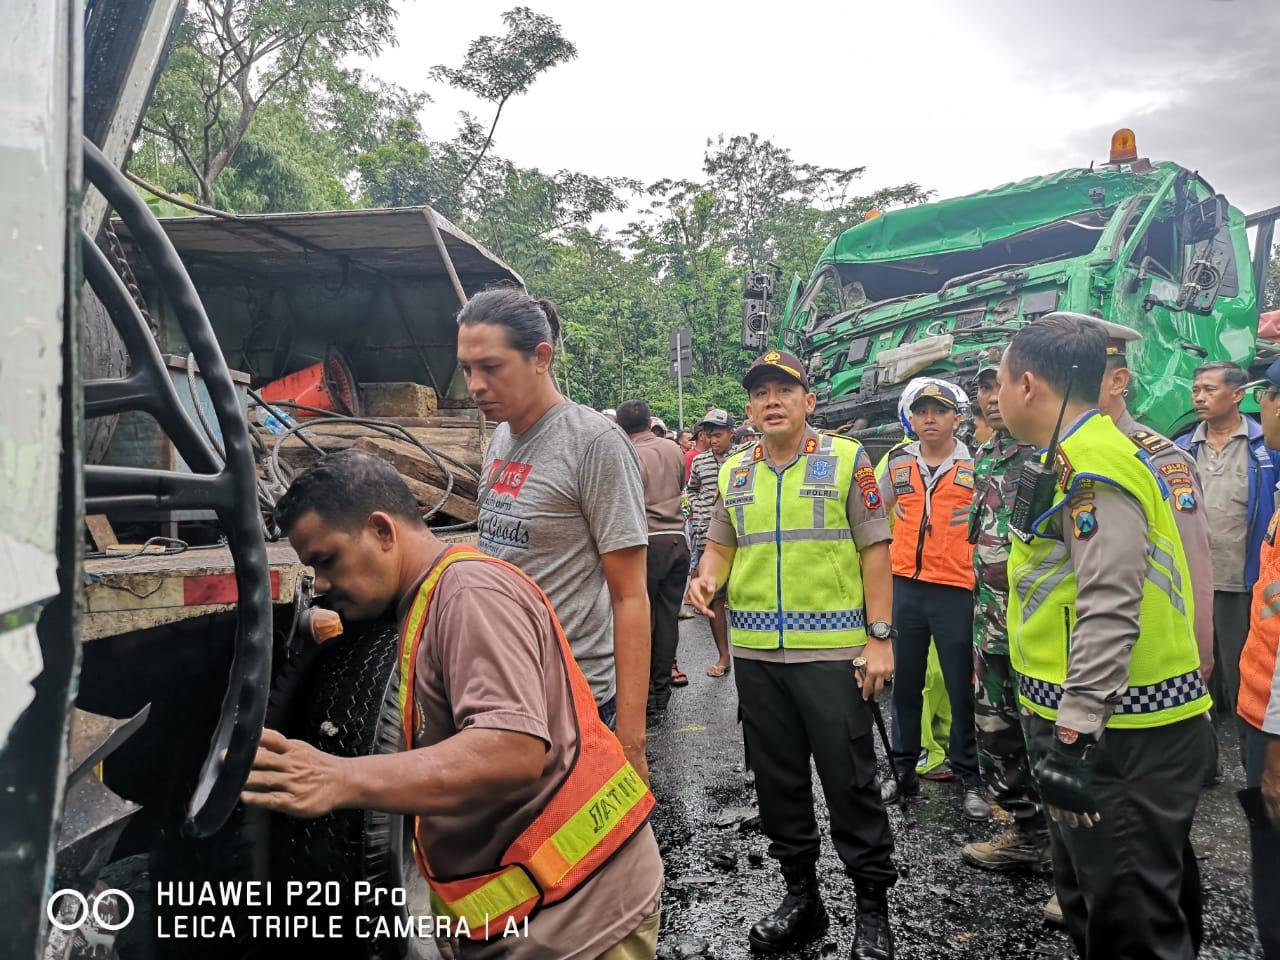 Bus Rombongan Bidan Terlibat Kecelakaan Dengan Truk Kontainer 46